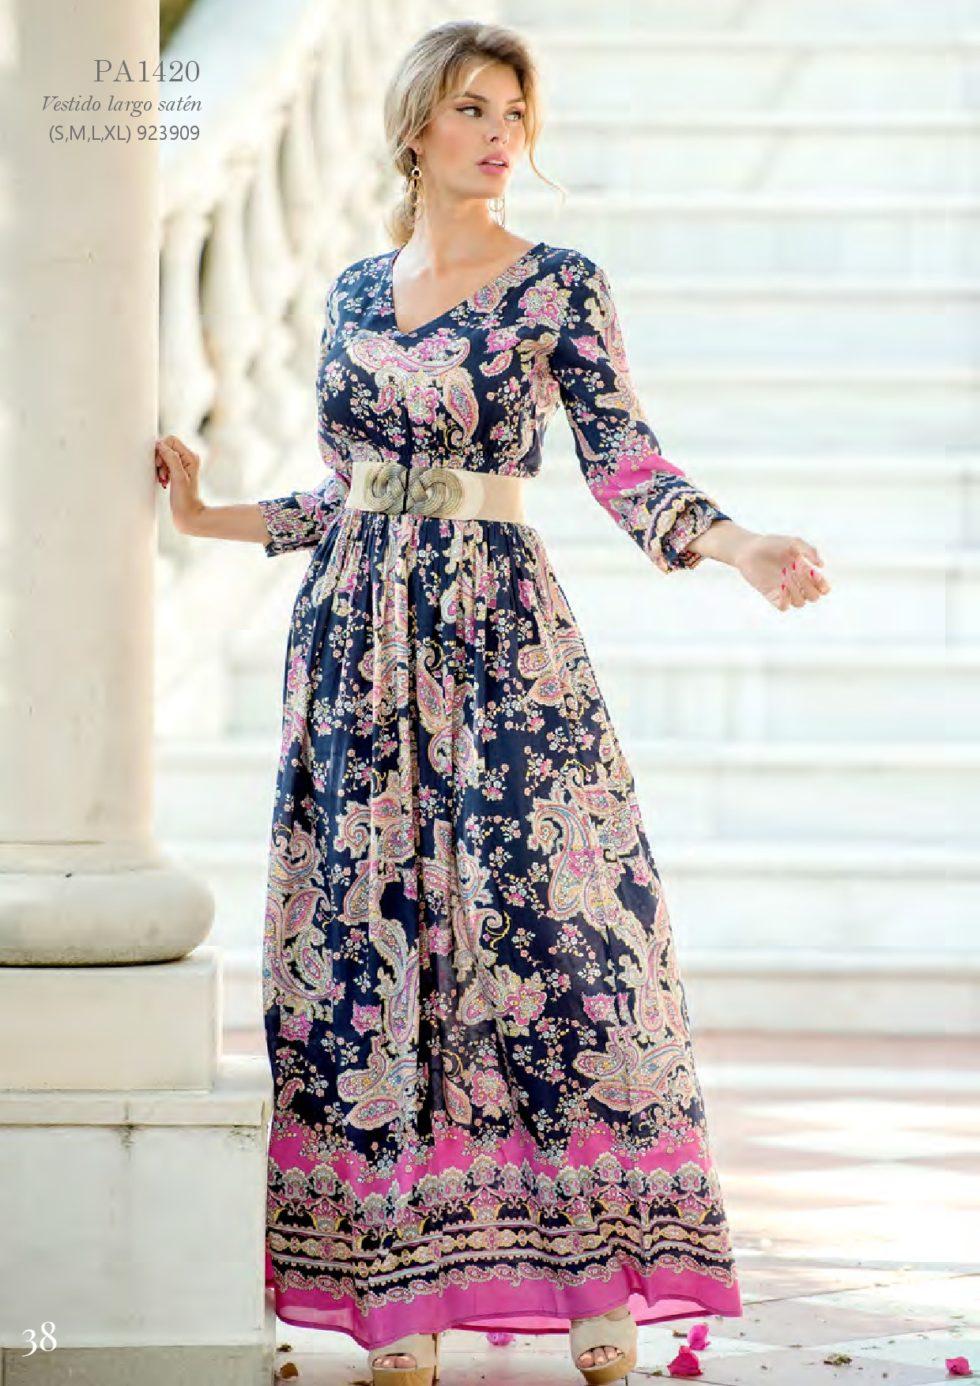 Flamenco Rosa Otoño 2021 MOD1-040